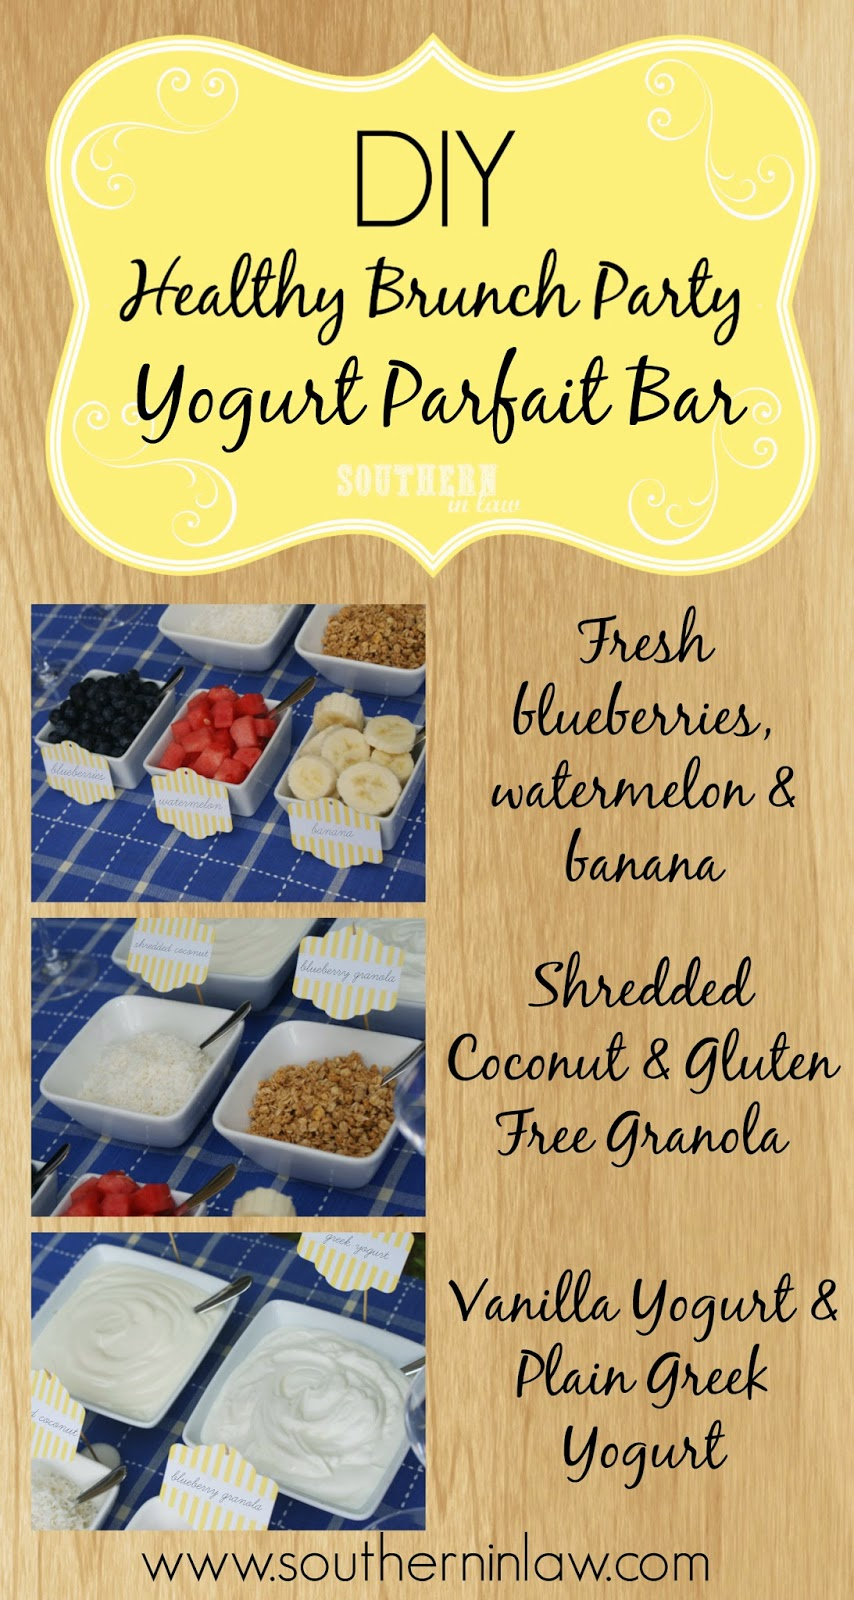 How to host your own healthy brunch party - DIY yogurt parfait bar